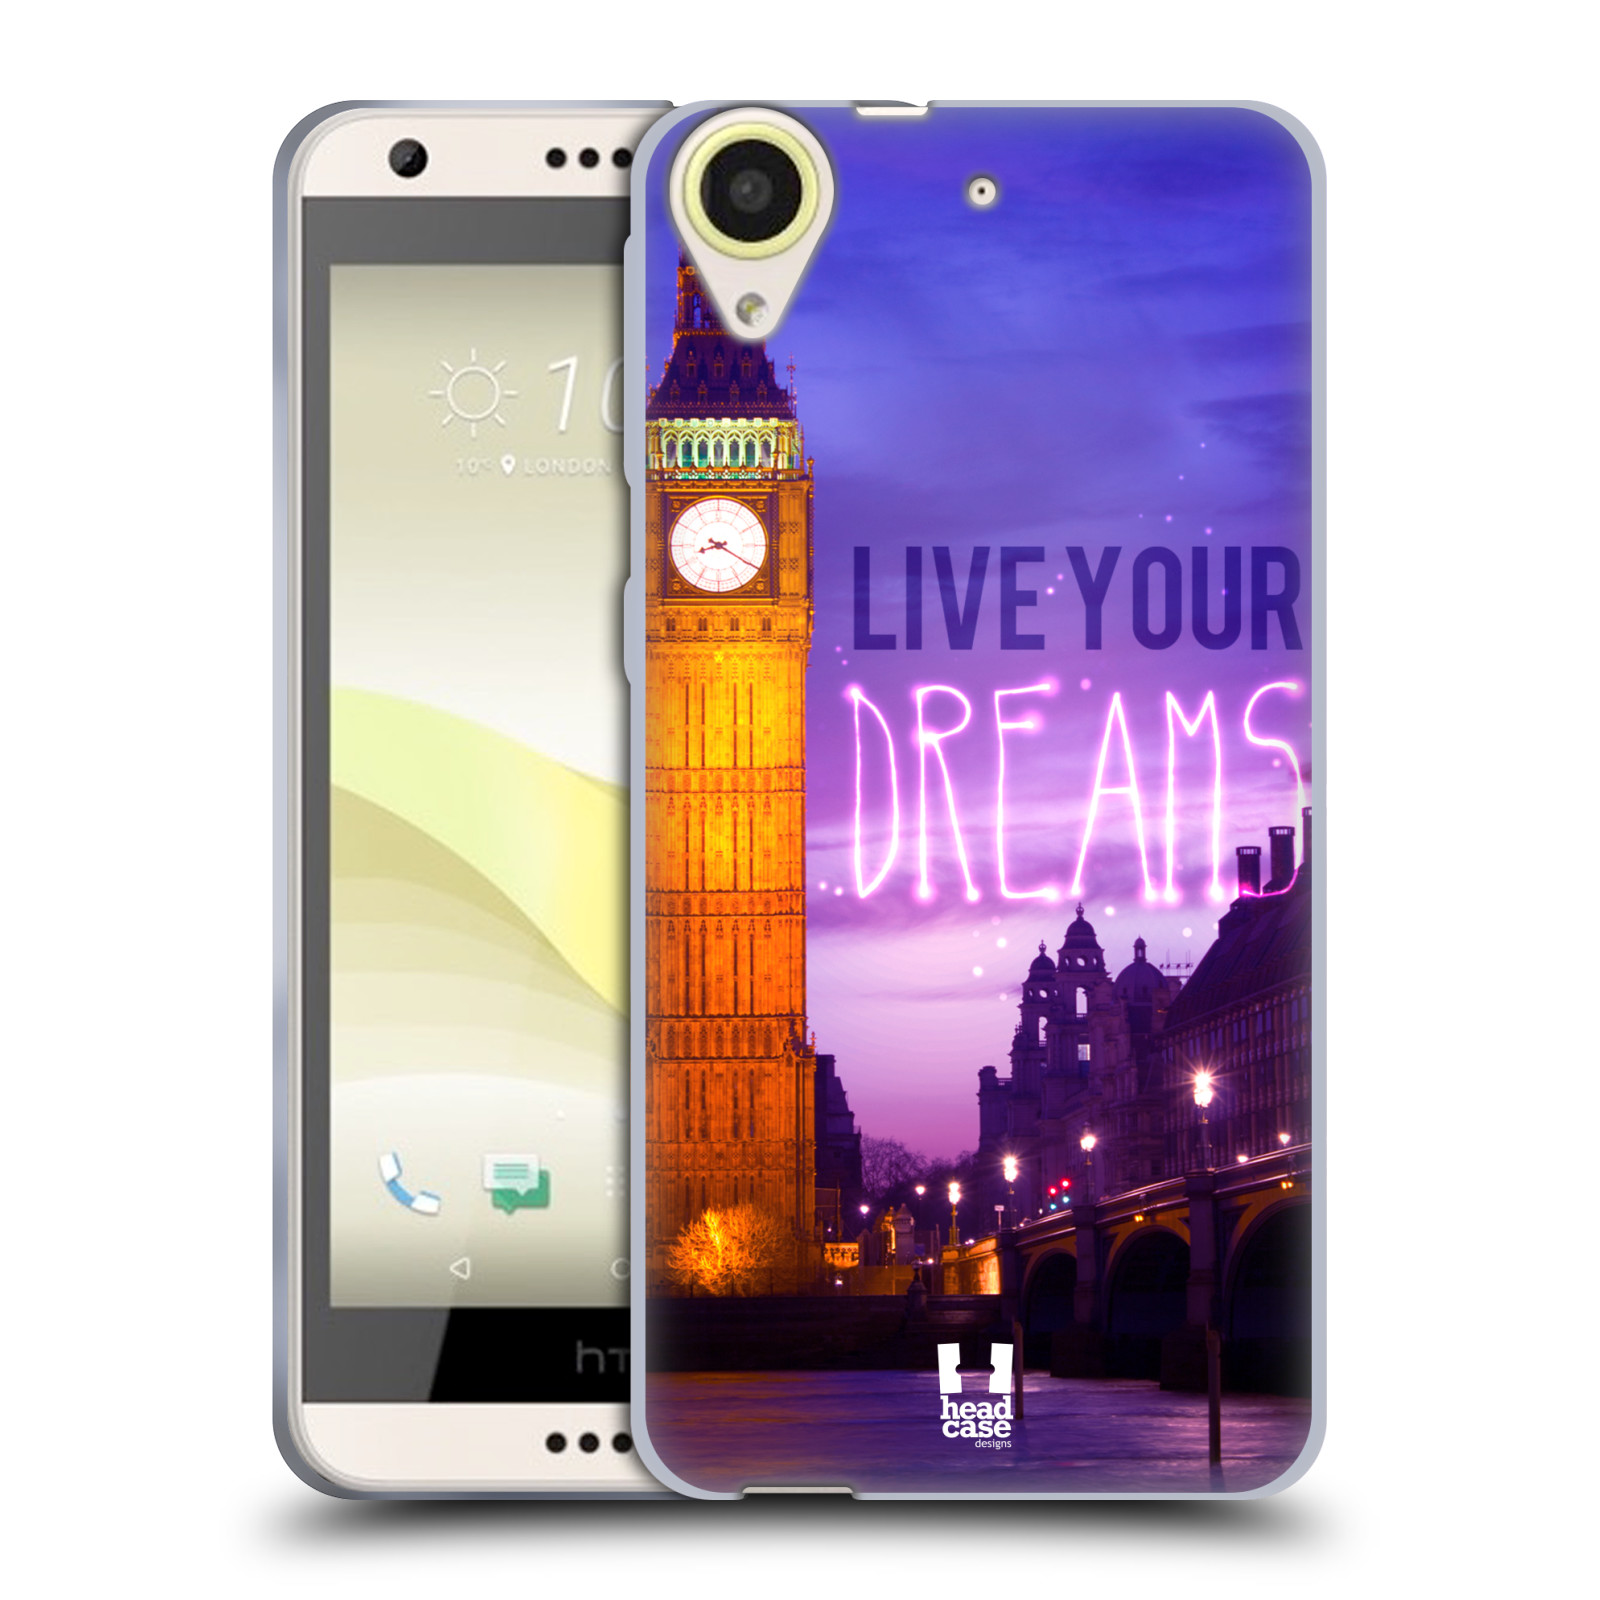 Silikonové pouzdro na mobil HTC Desire 650 HEAD CASE DREAMS (Silikonový kryt či obal na mobilní telefon HTC Desire 650)